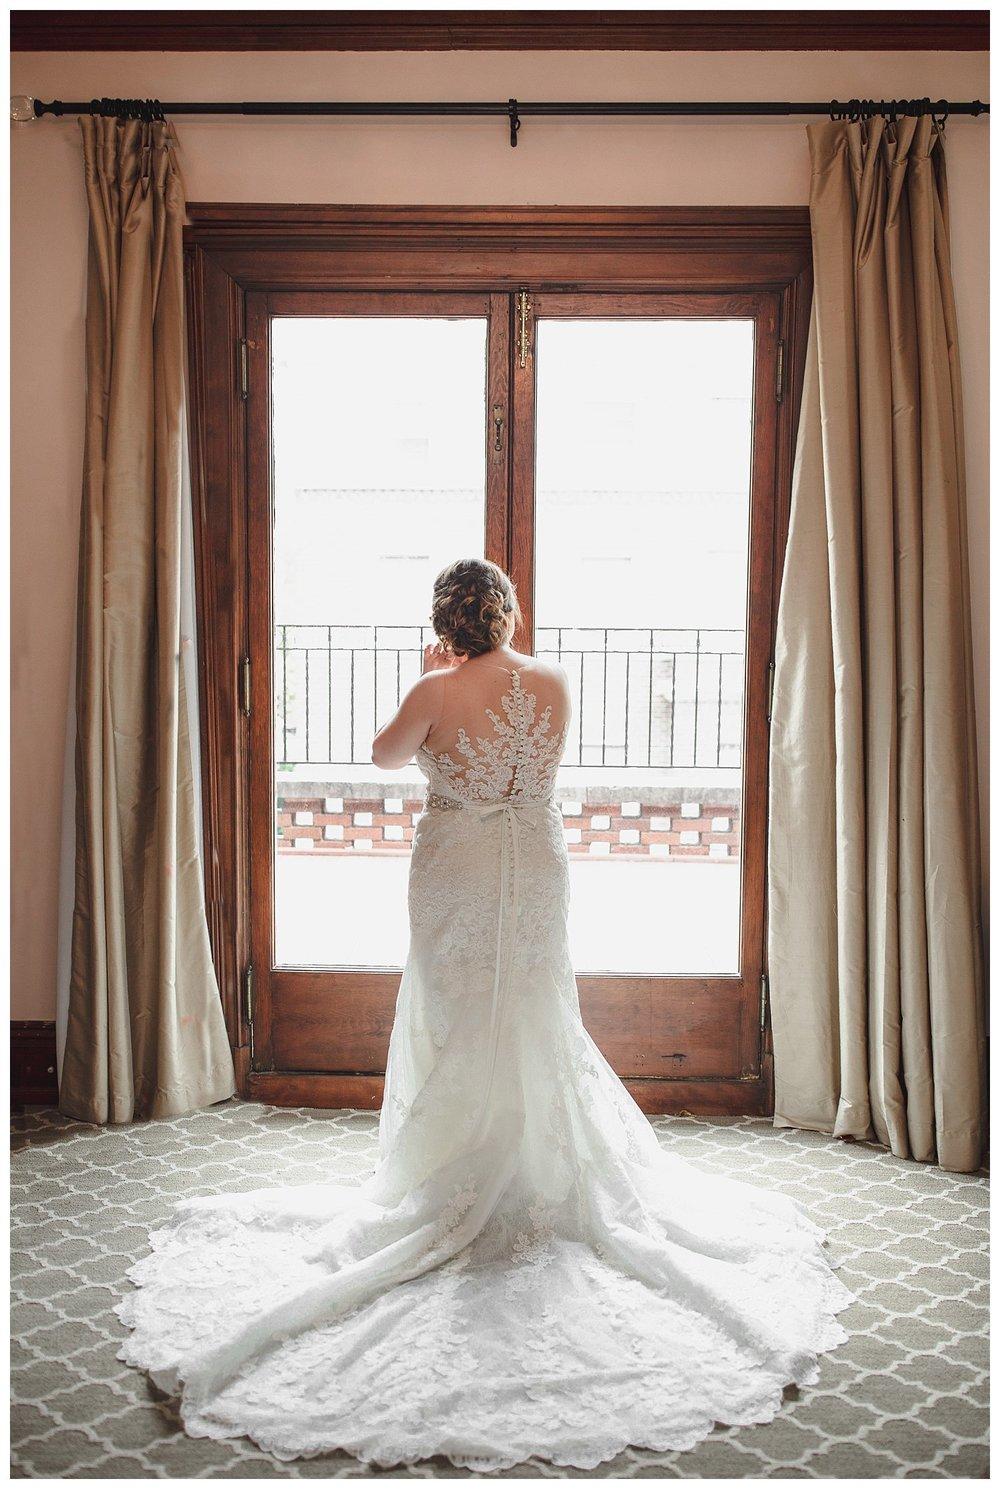 Kelsey_Diane_Photography_Loose_Mansion_Wedding_Photography_Kansas_City_Victor_Lyndsay_0116.jpg